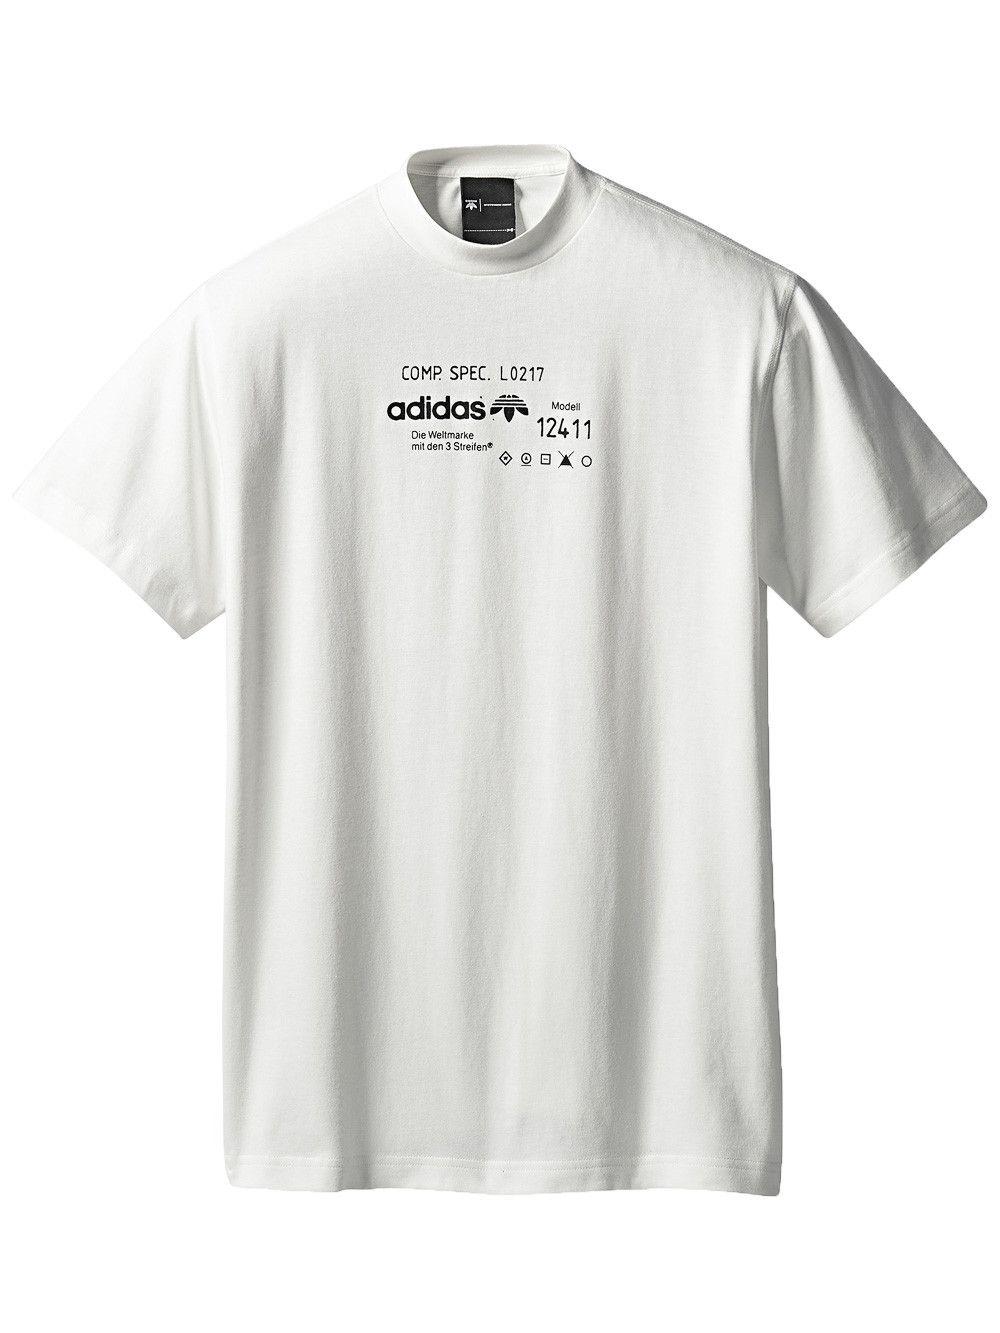 Adidas Originals By Alexander Wang T Shirt Mit Logo Print